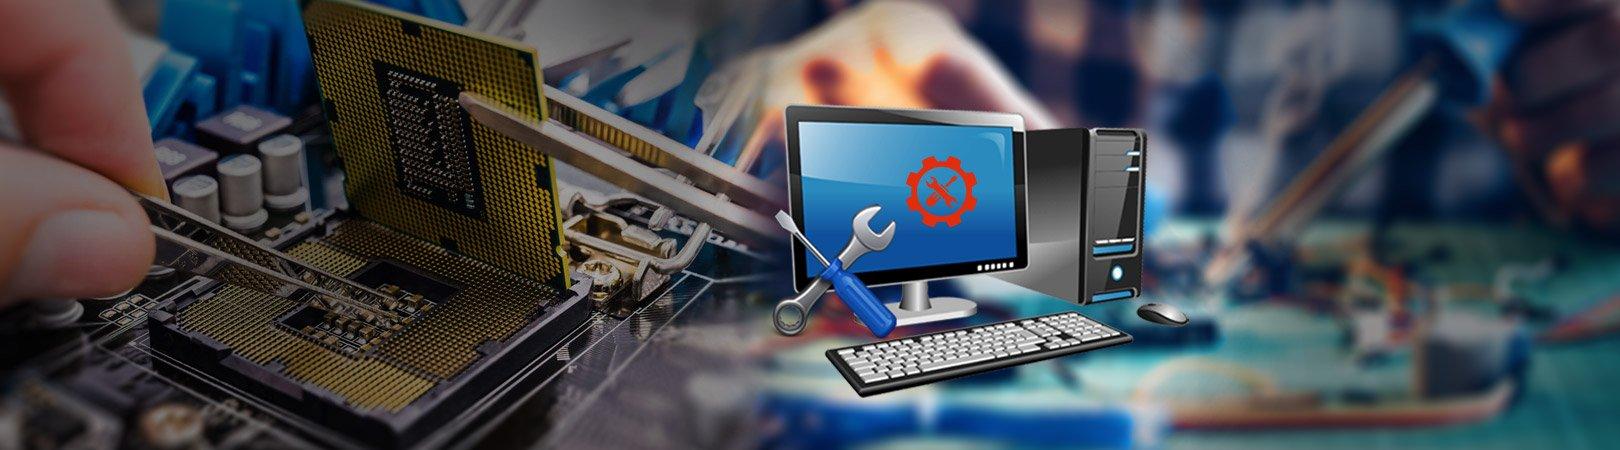 banner image - Asus Laptop Services Center